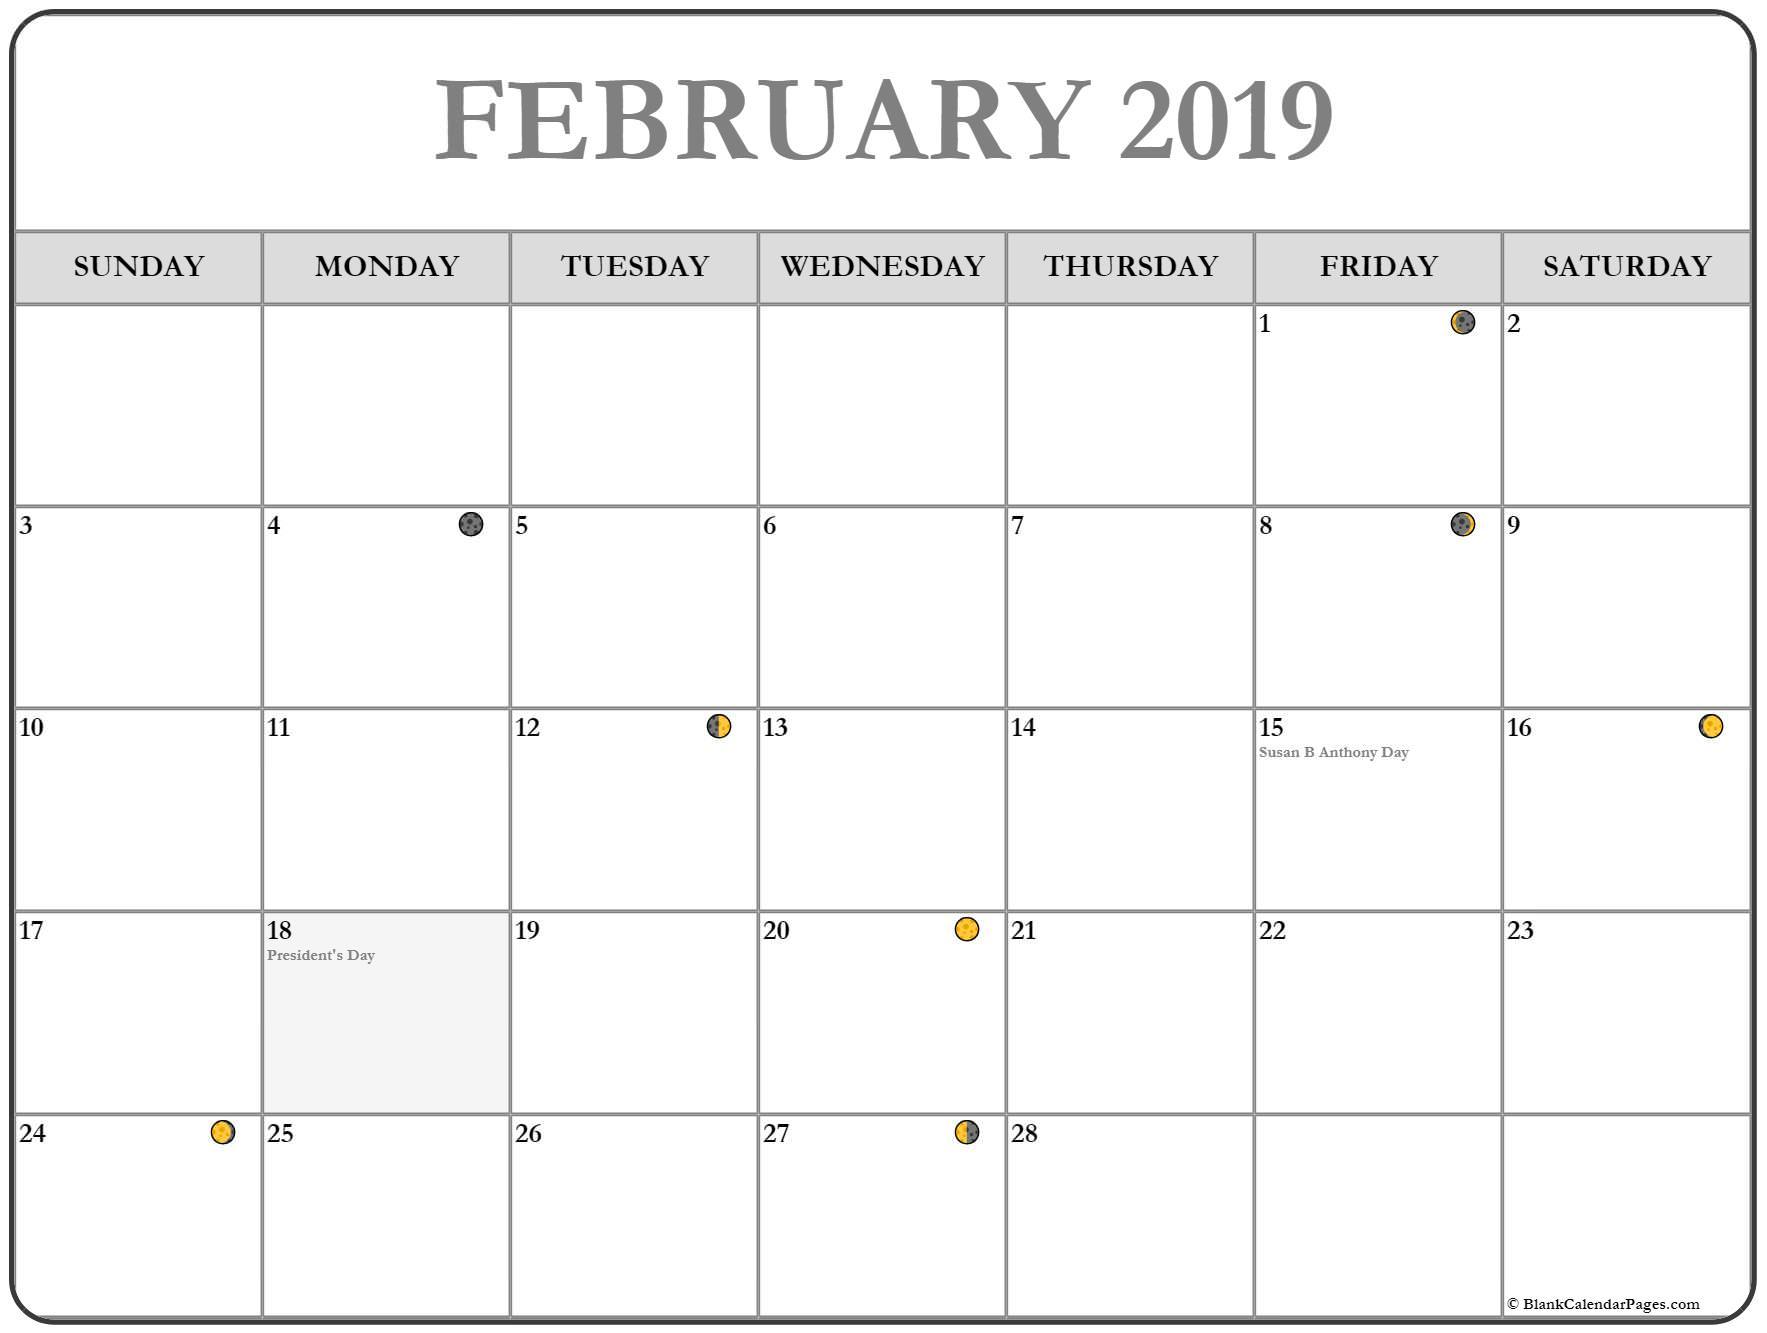 Moon Phases Calendar February 2019